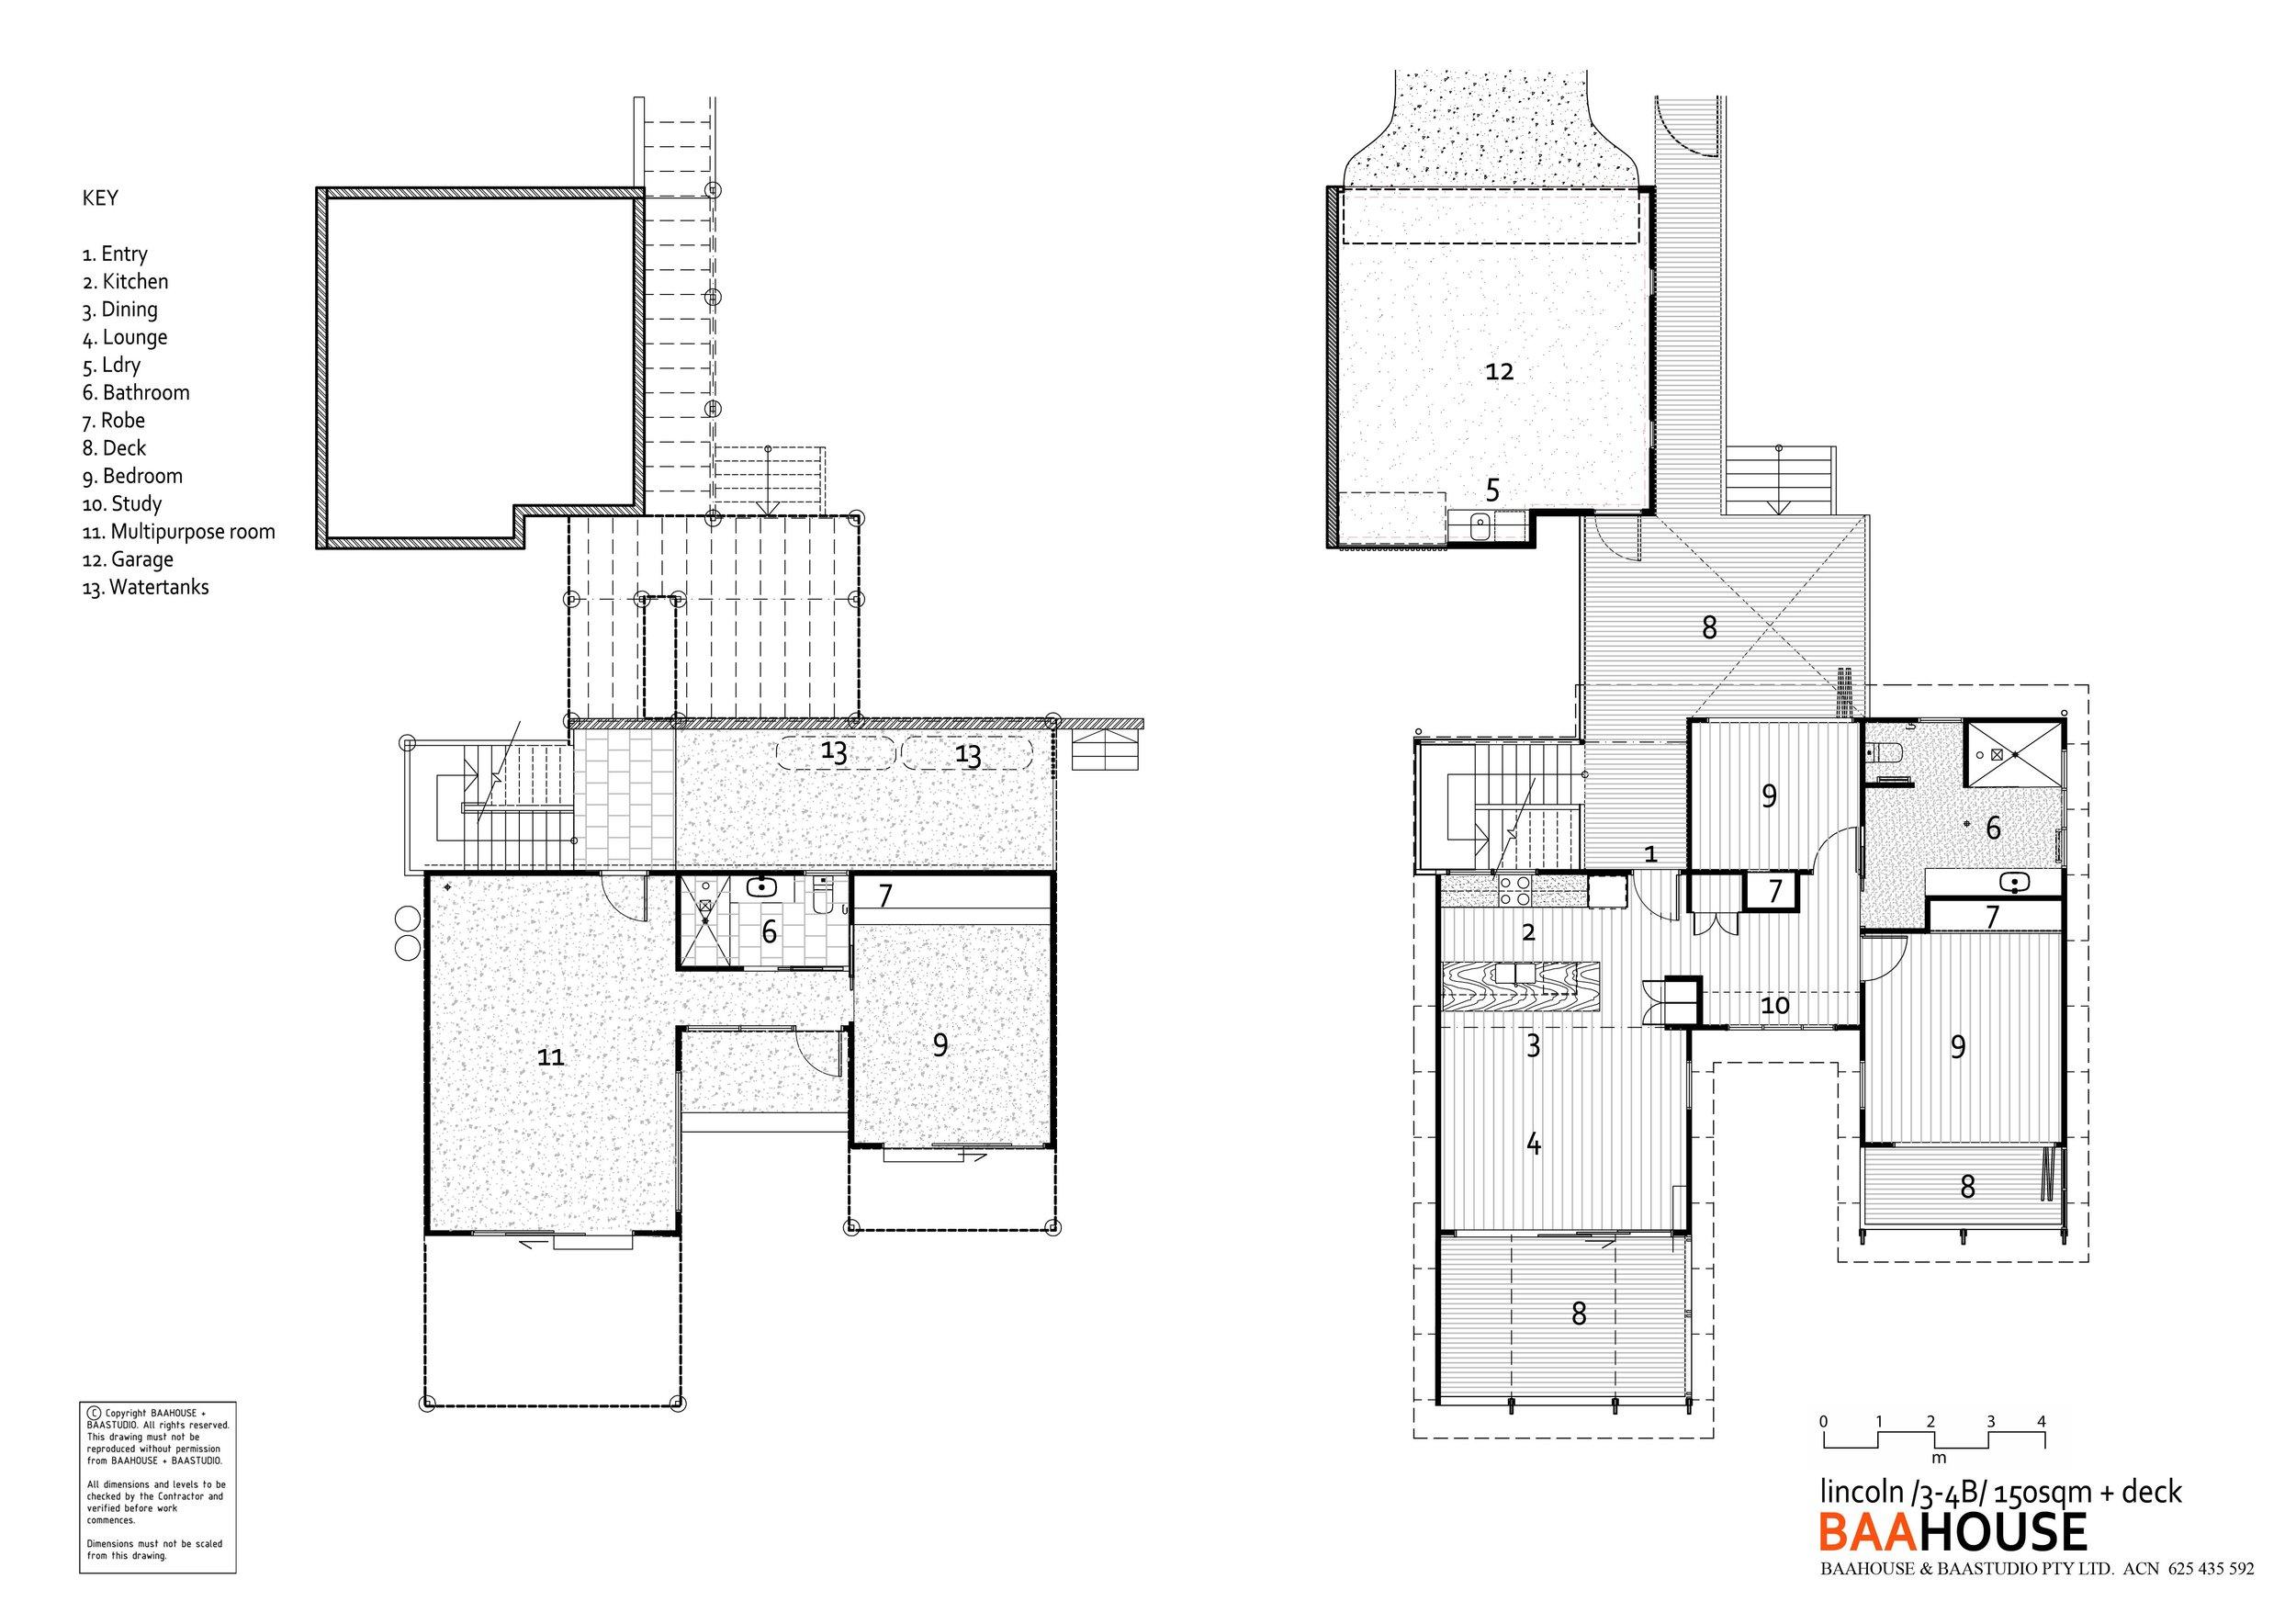 Lincoln 3/4 bedroom 2 level design